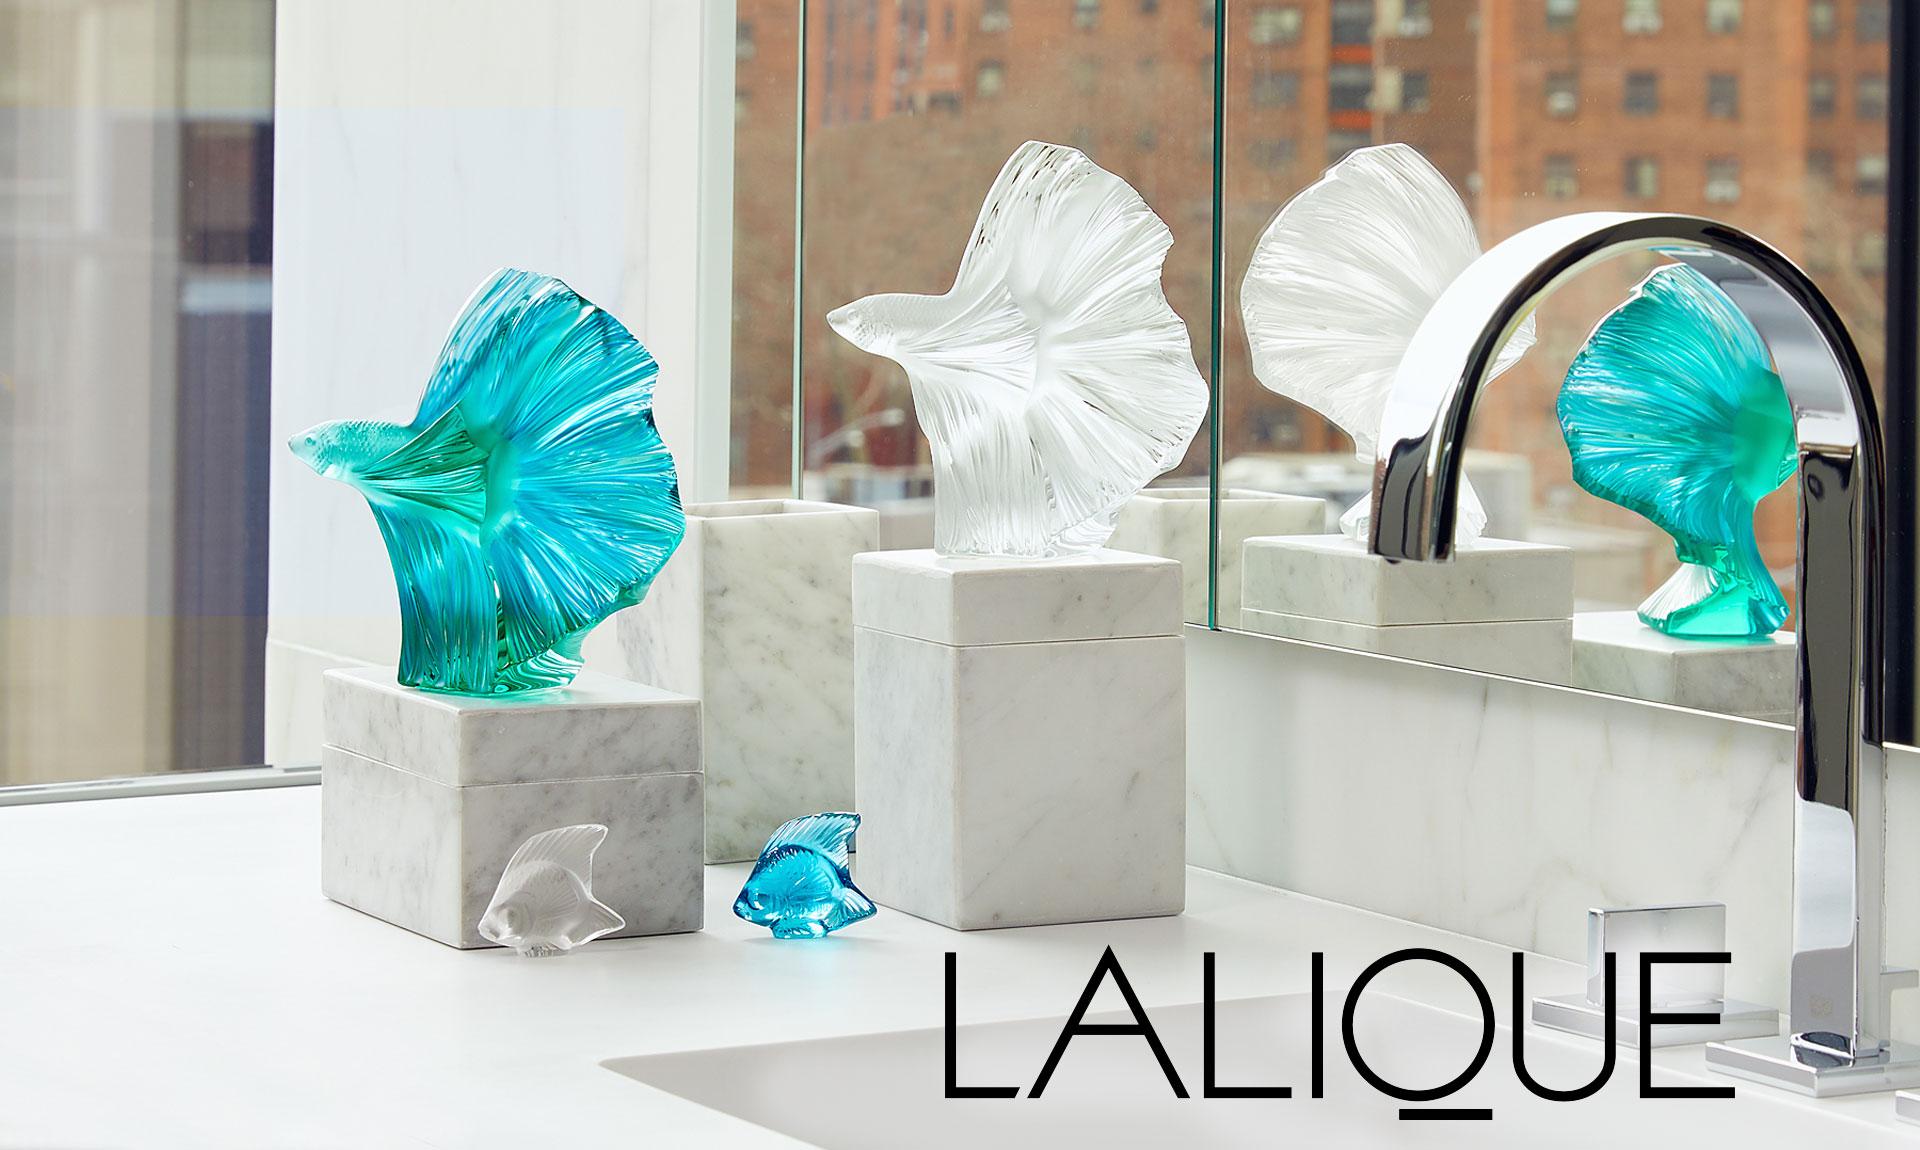 Waterford crystal swarovski baccarat lalique riedel orrefors 1 2 reviewsmspy